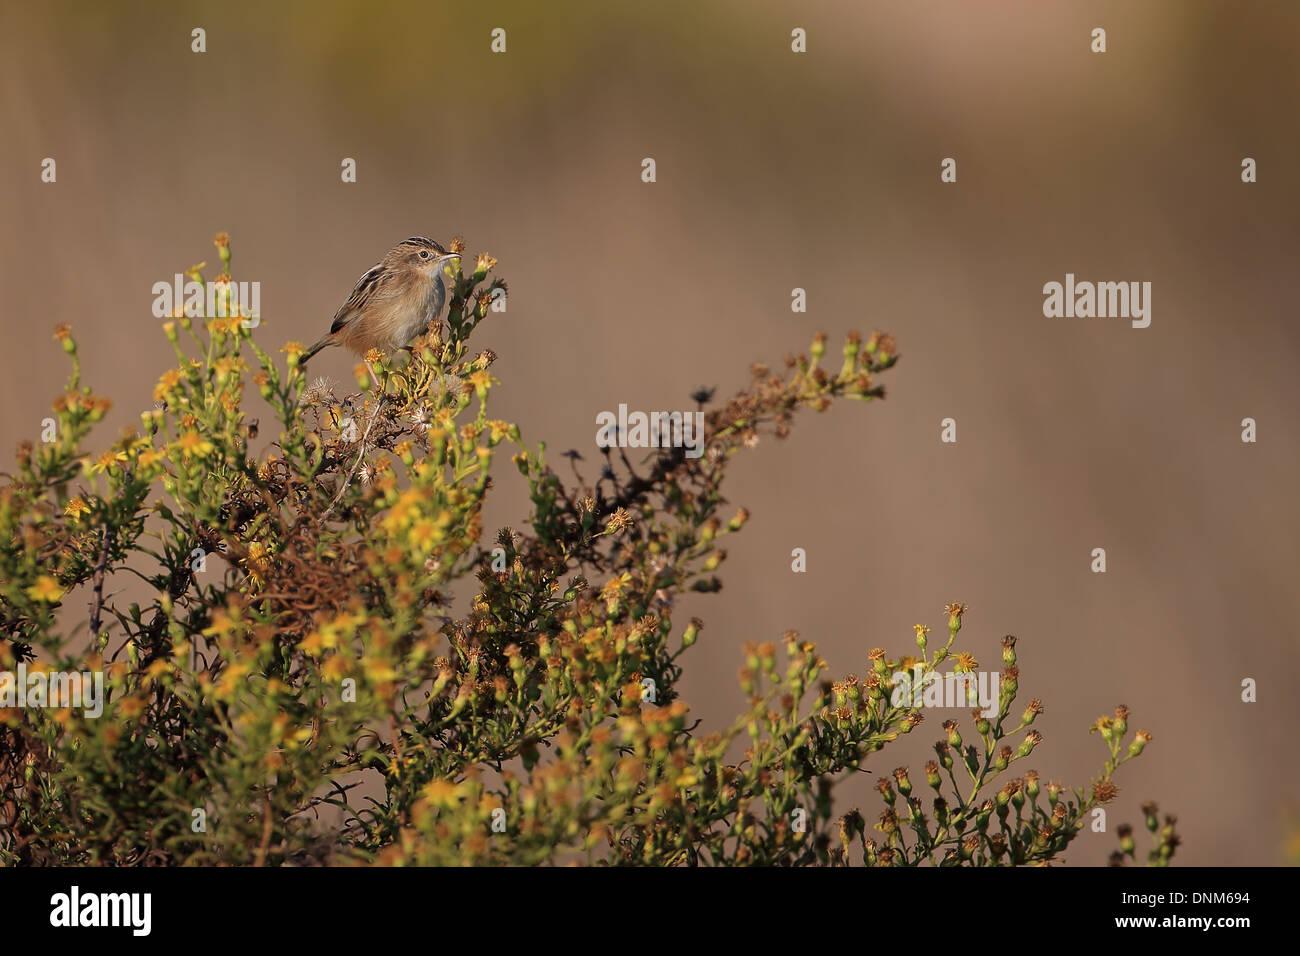 Zitting Cisticola (Cisticola juncidis) - Stock Image